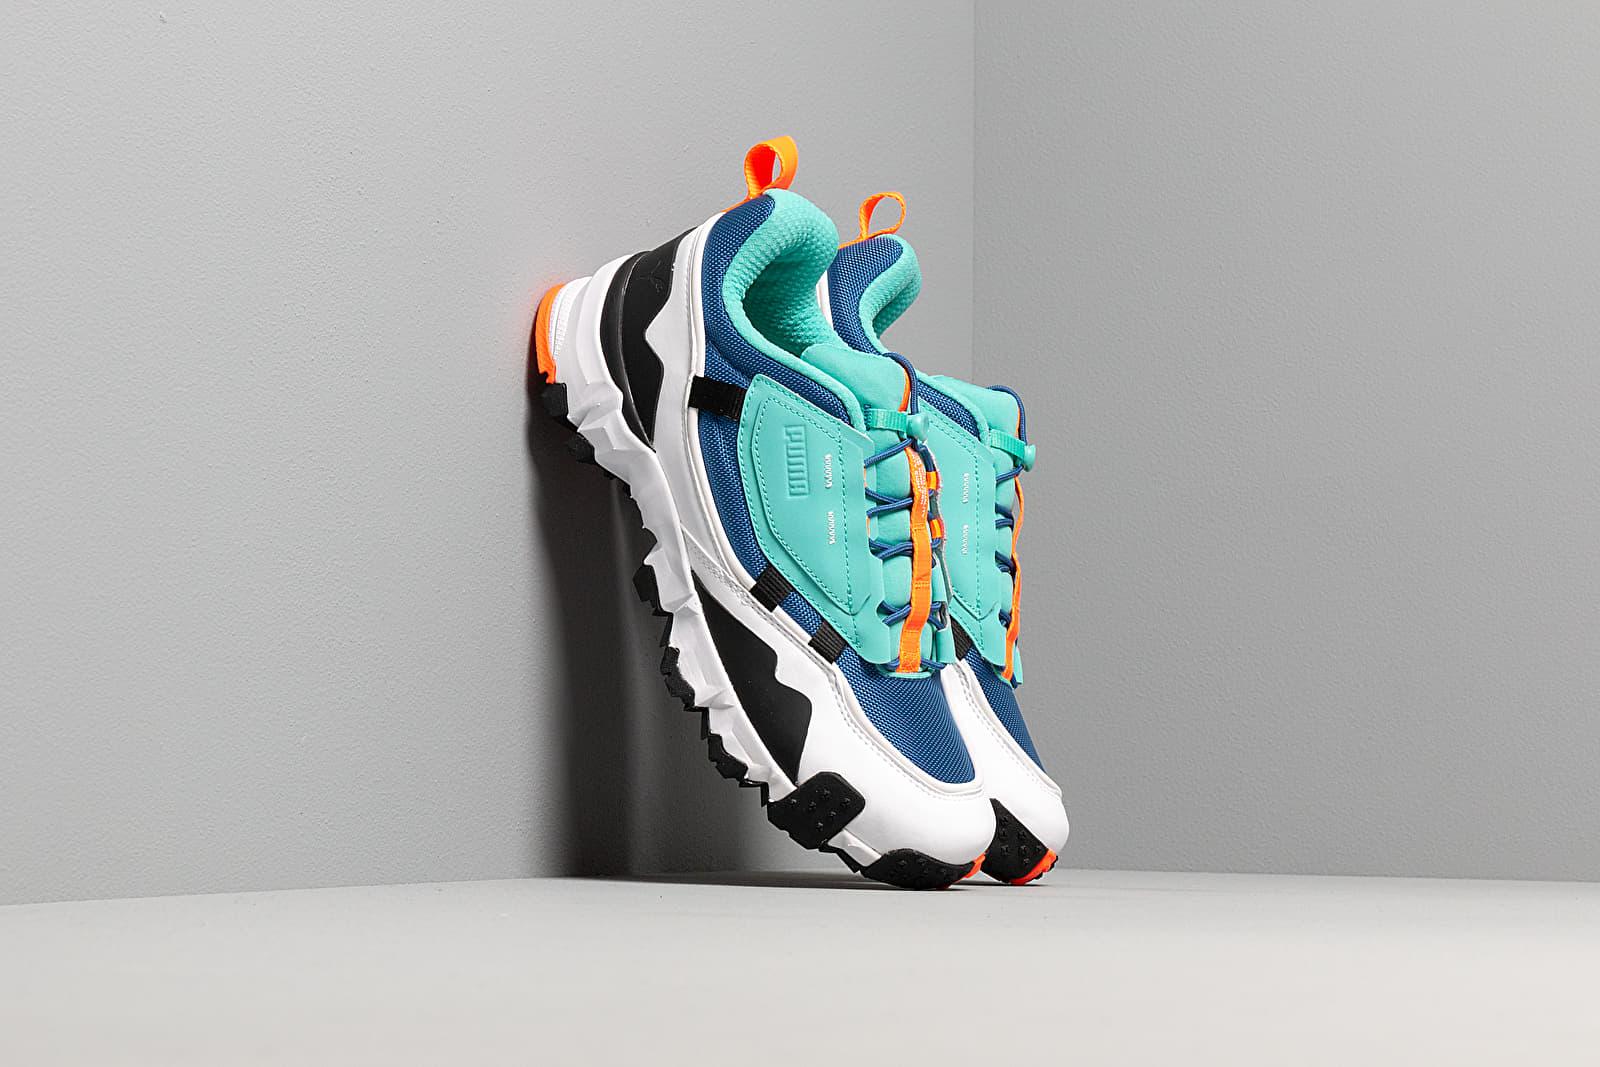 Men's shoes Puma Trailfox Overland Galaxy Blue-Blue Turquoise